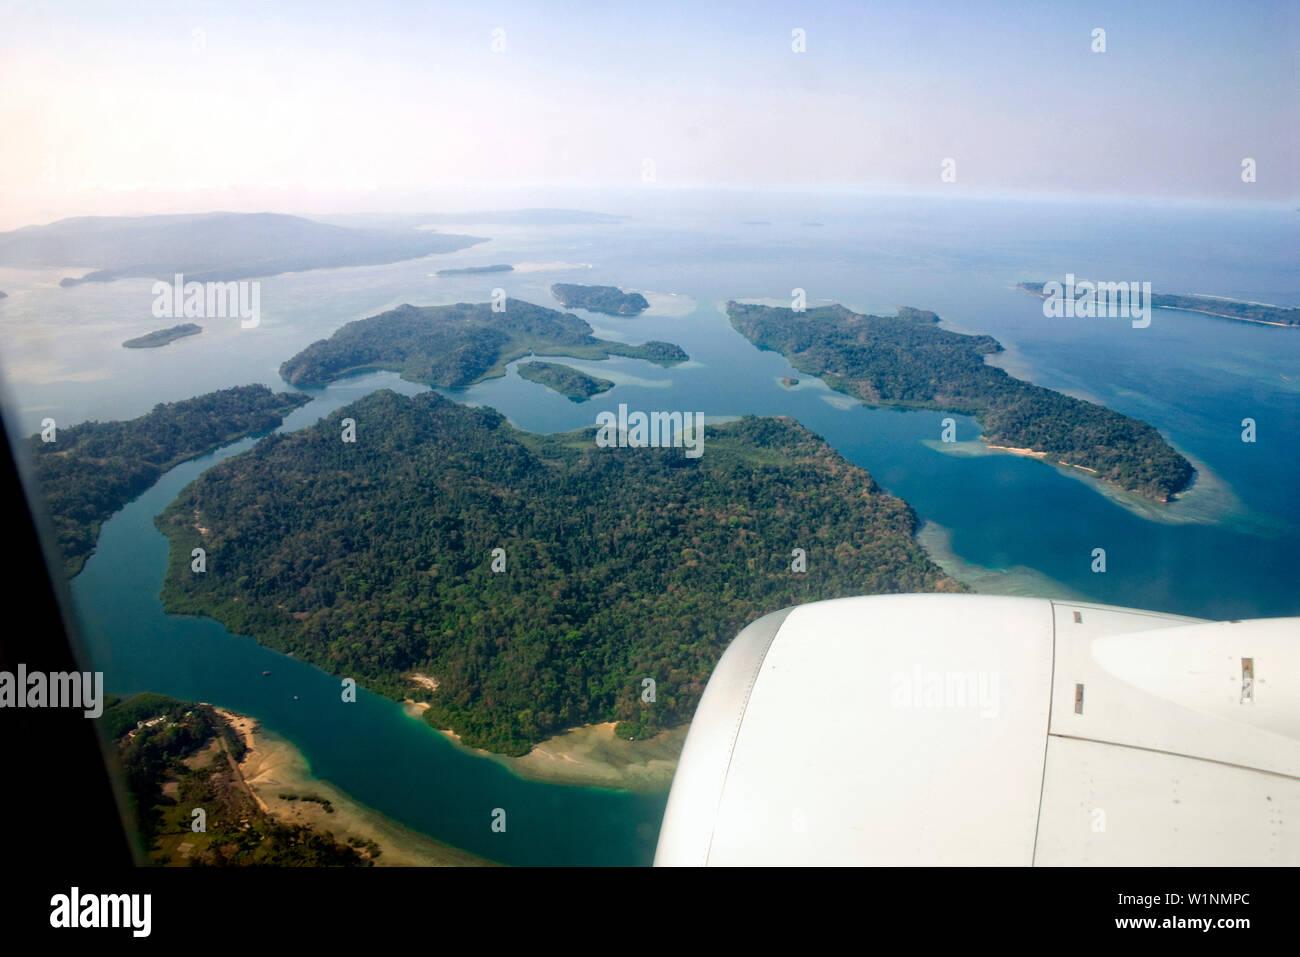 Aerial Photo, Andaman Islands, Andaman Sea, India, Inselgruppe der Andamanen Ausschnitt, , Golf von Bengalen, Andamanen See, Indien, im April 2004 And - Stock Image